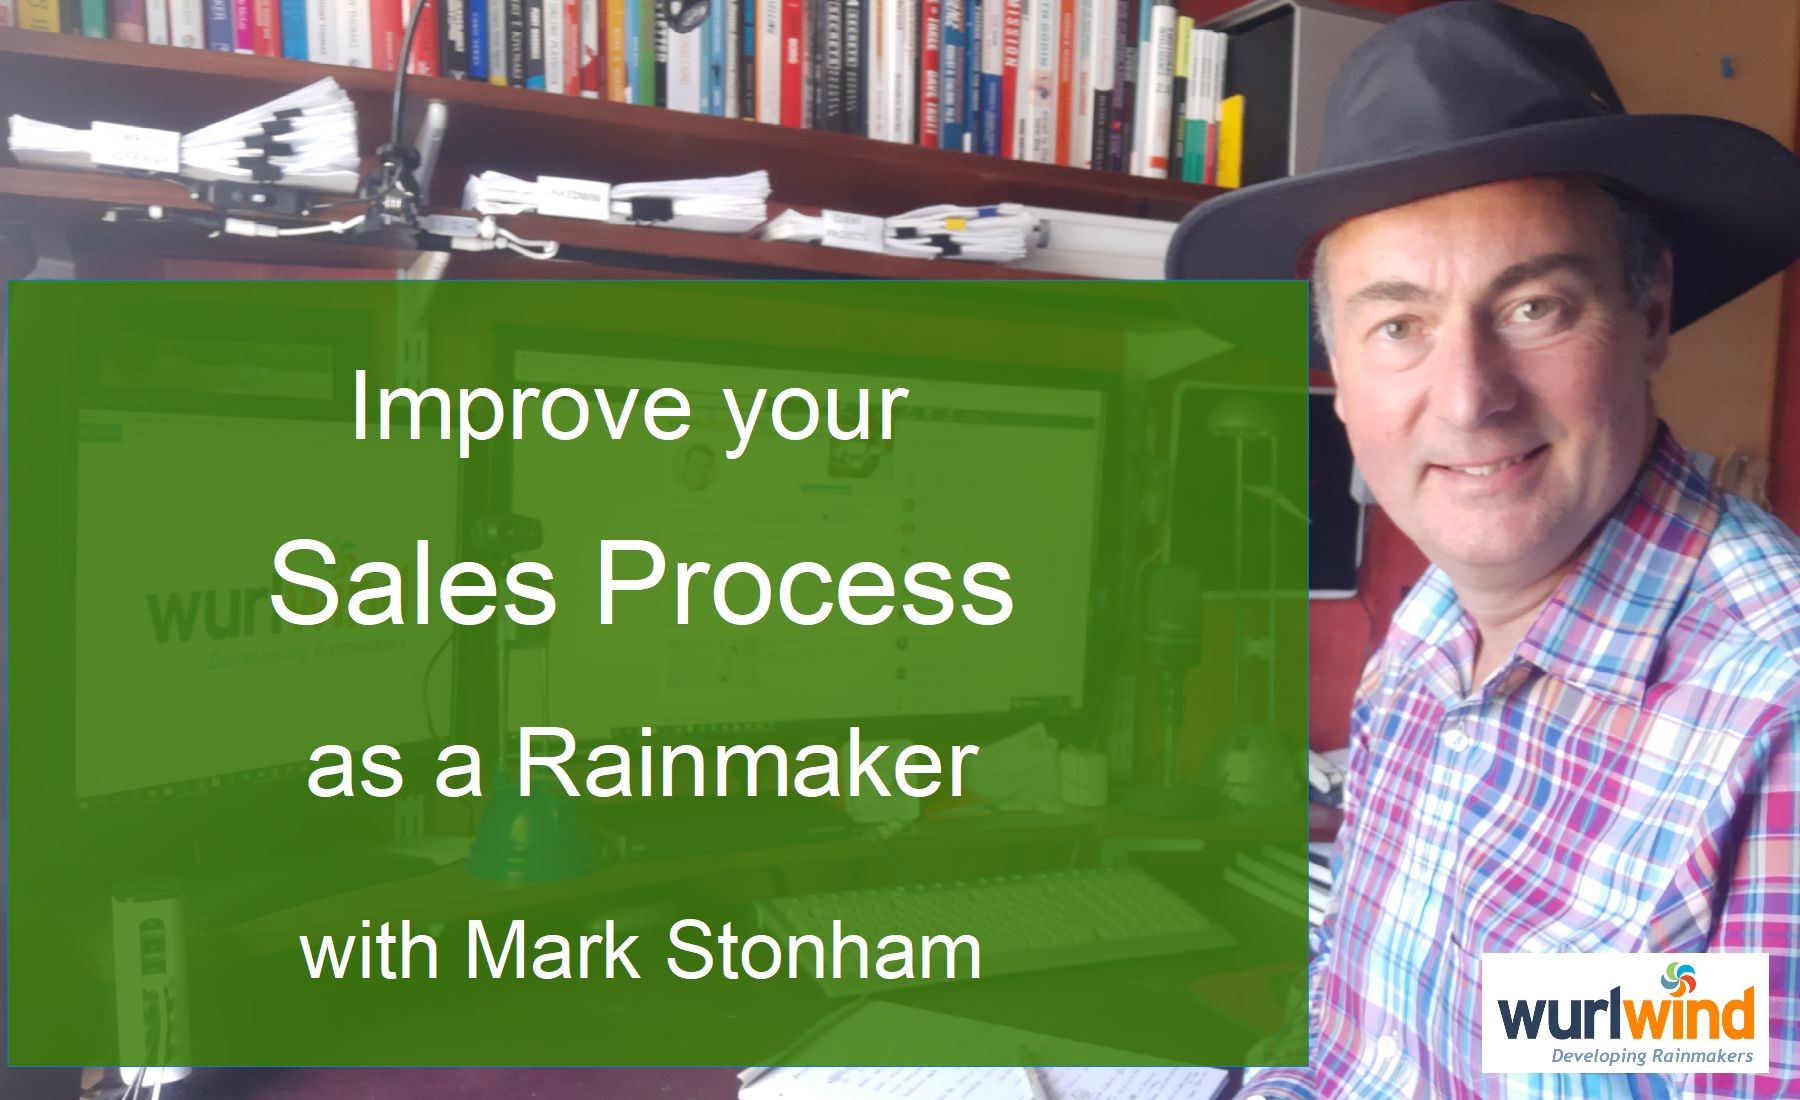 Rainmaker Improve Sales Process with Mark Stonham